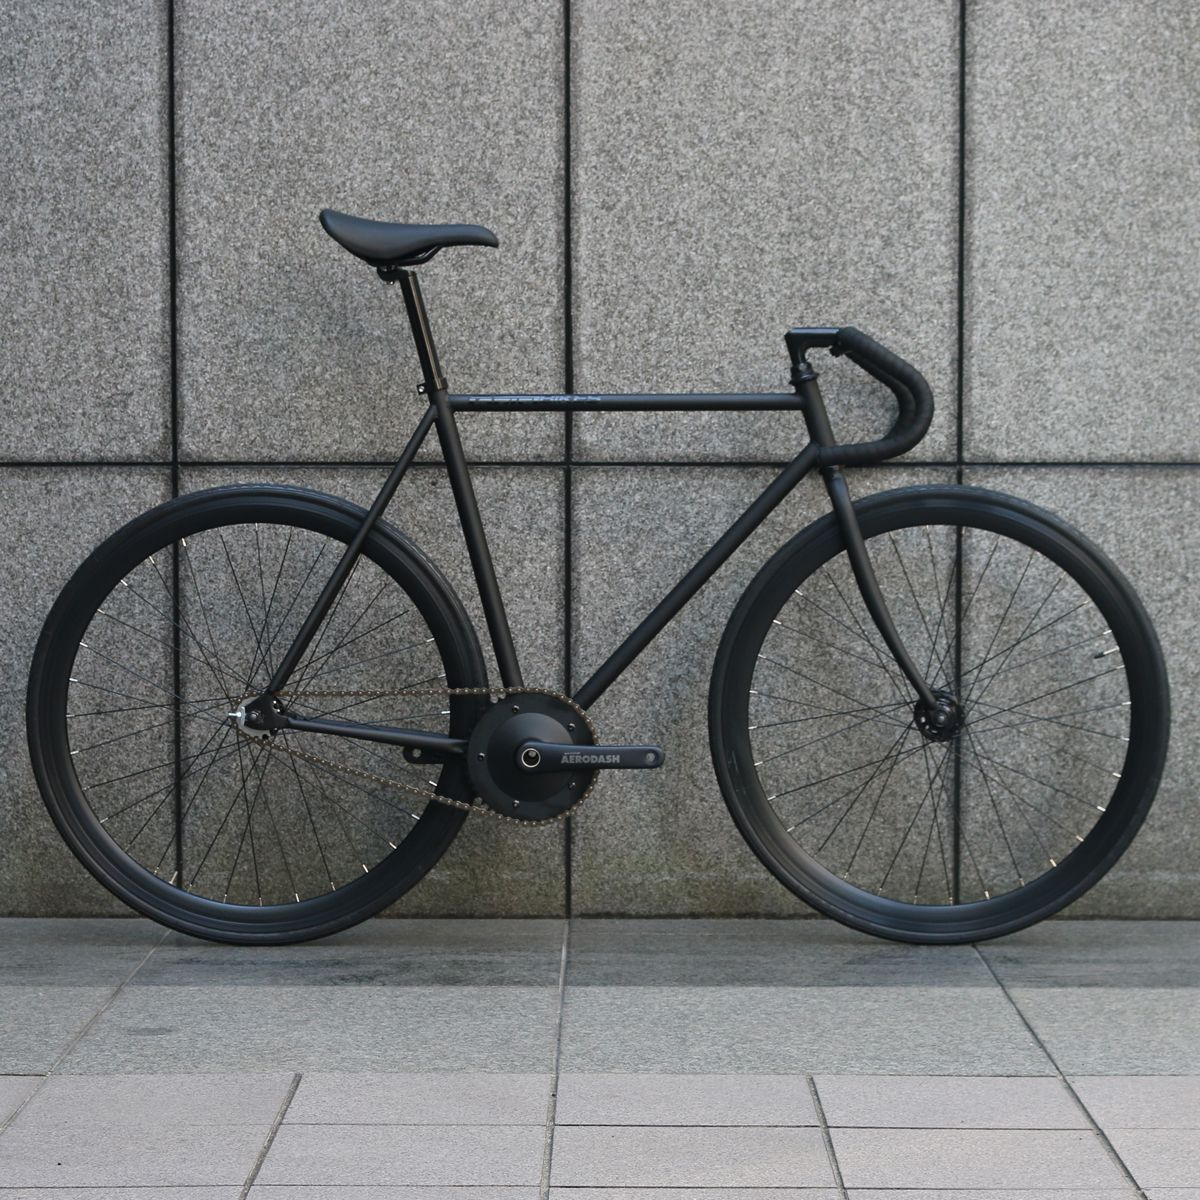 【 SPECIAL PRICE 】ピストバイク 完成車 CARTEL BIKES AVENUE MAT BLACK AERODASH DIRECT CRANKSET CUSTOM